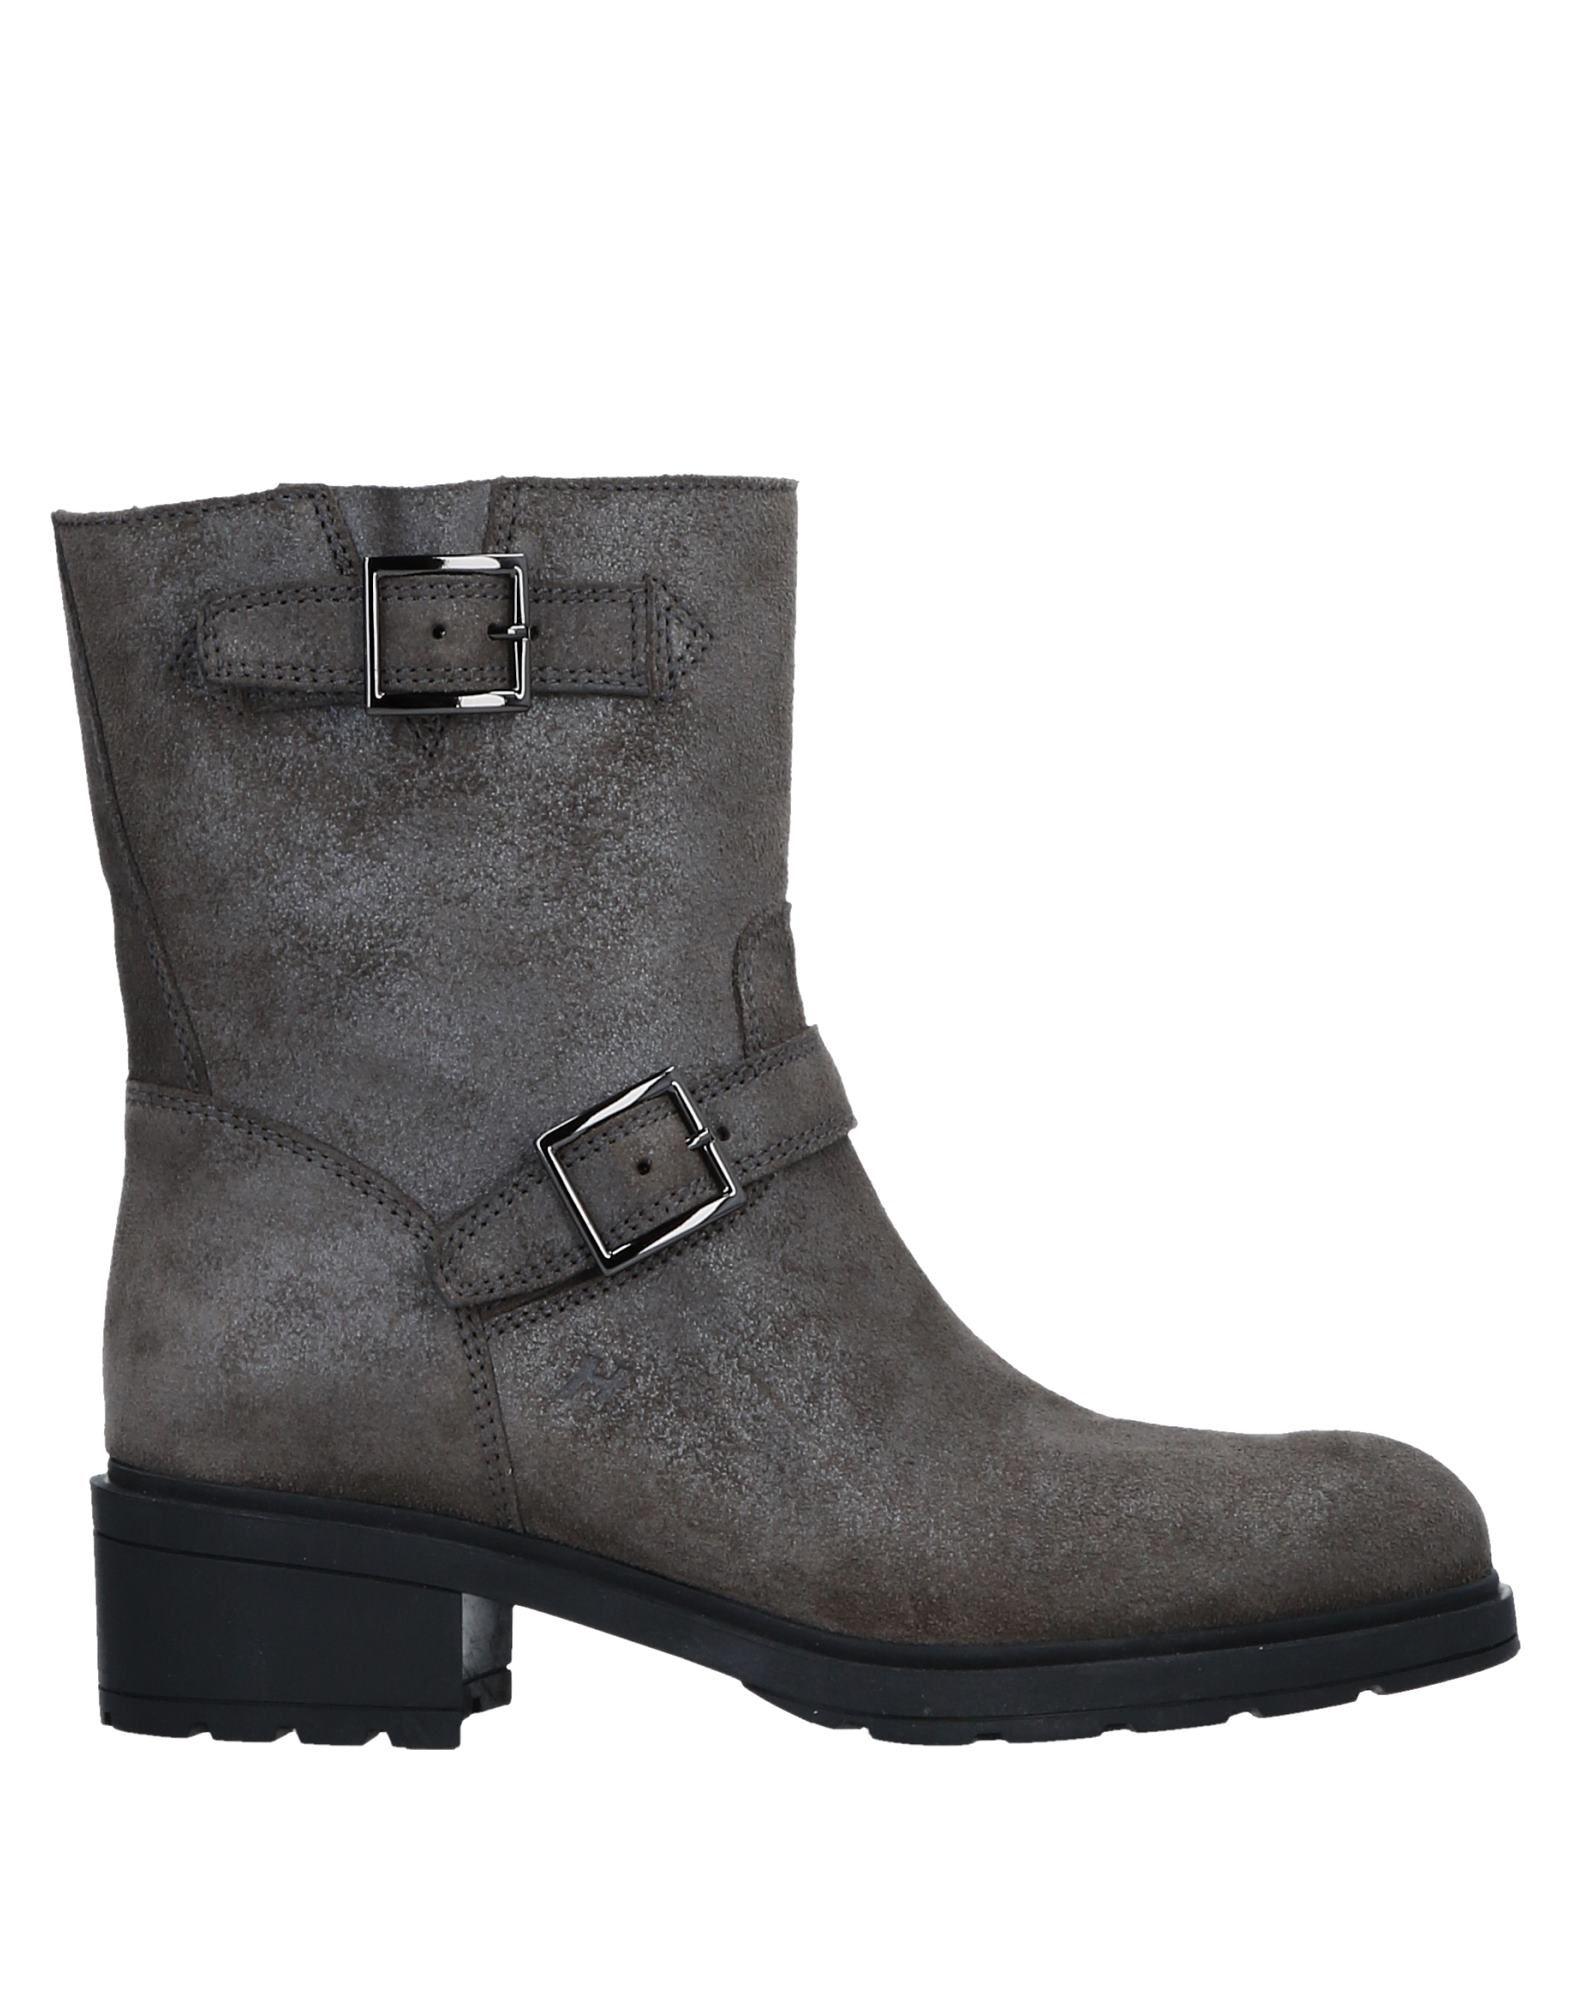 Hogan Stiefelette  Damen  Stiefelette 11230286RO Heiße Schuhe 9d8a24